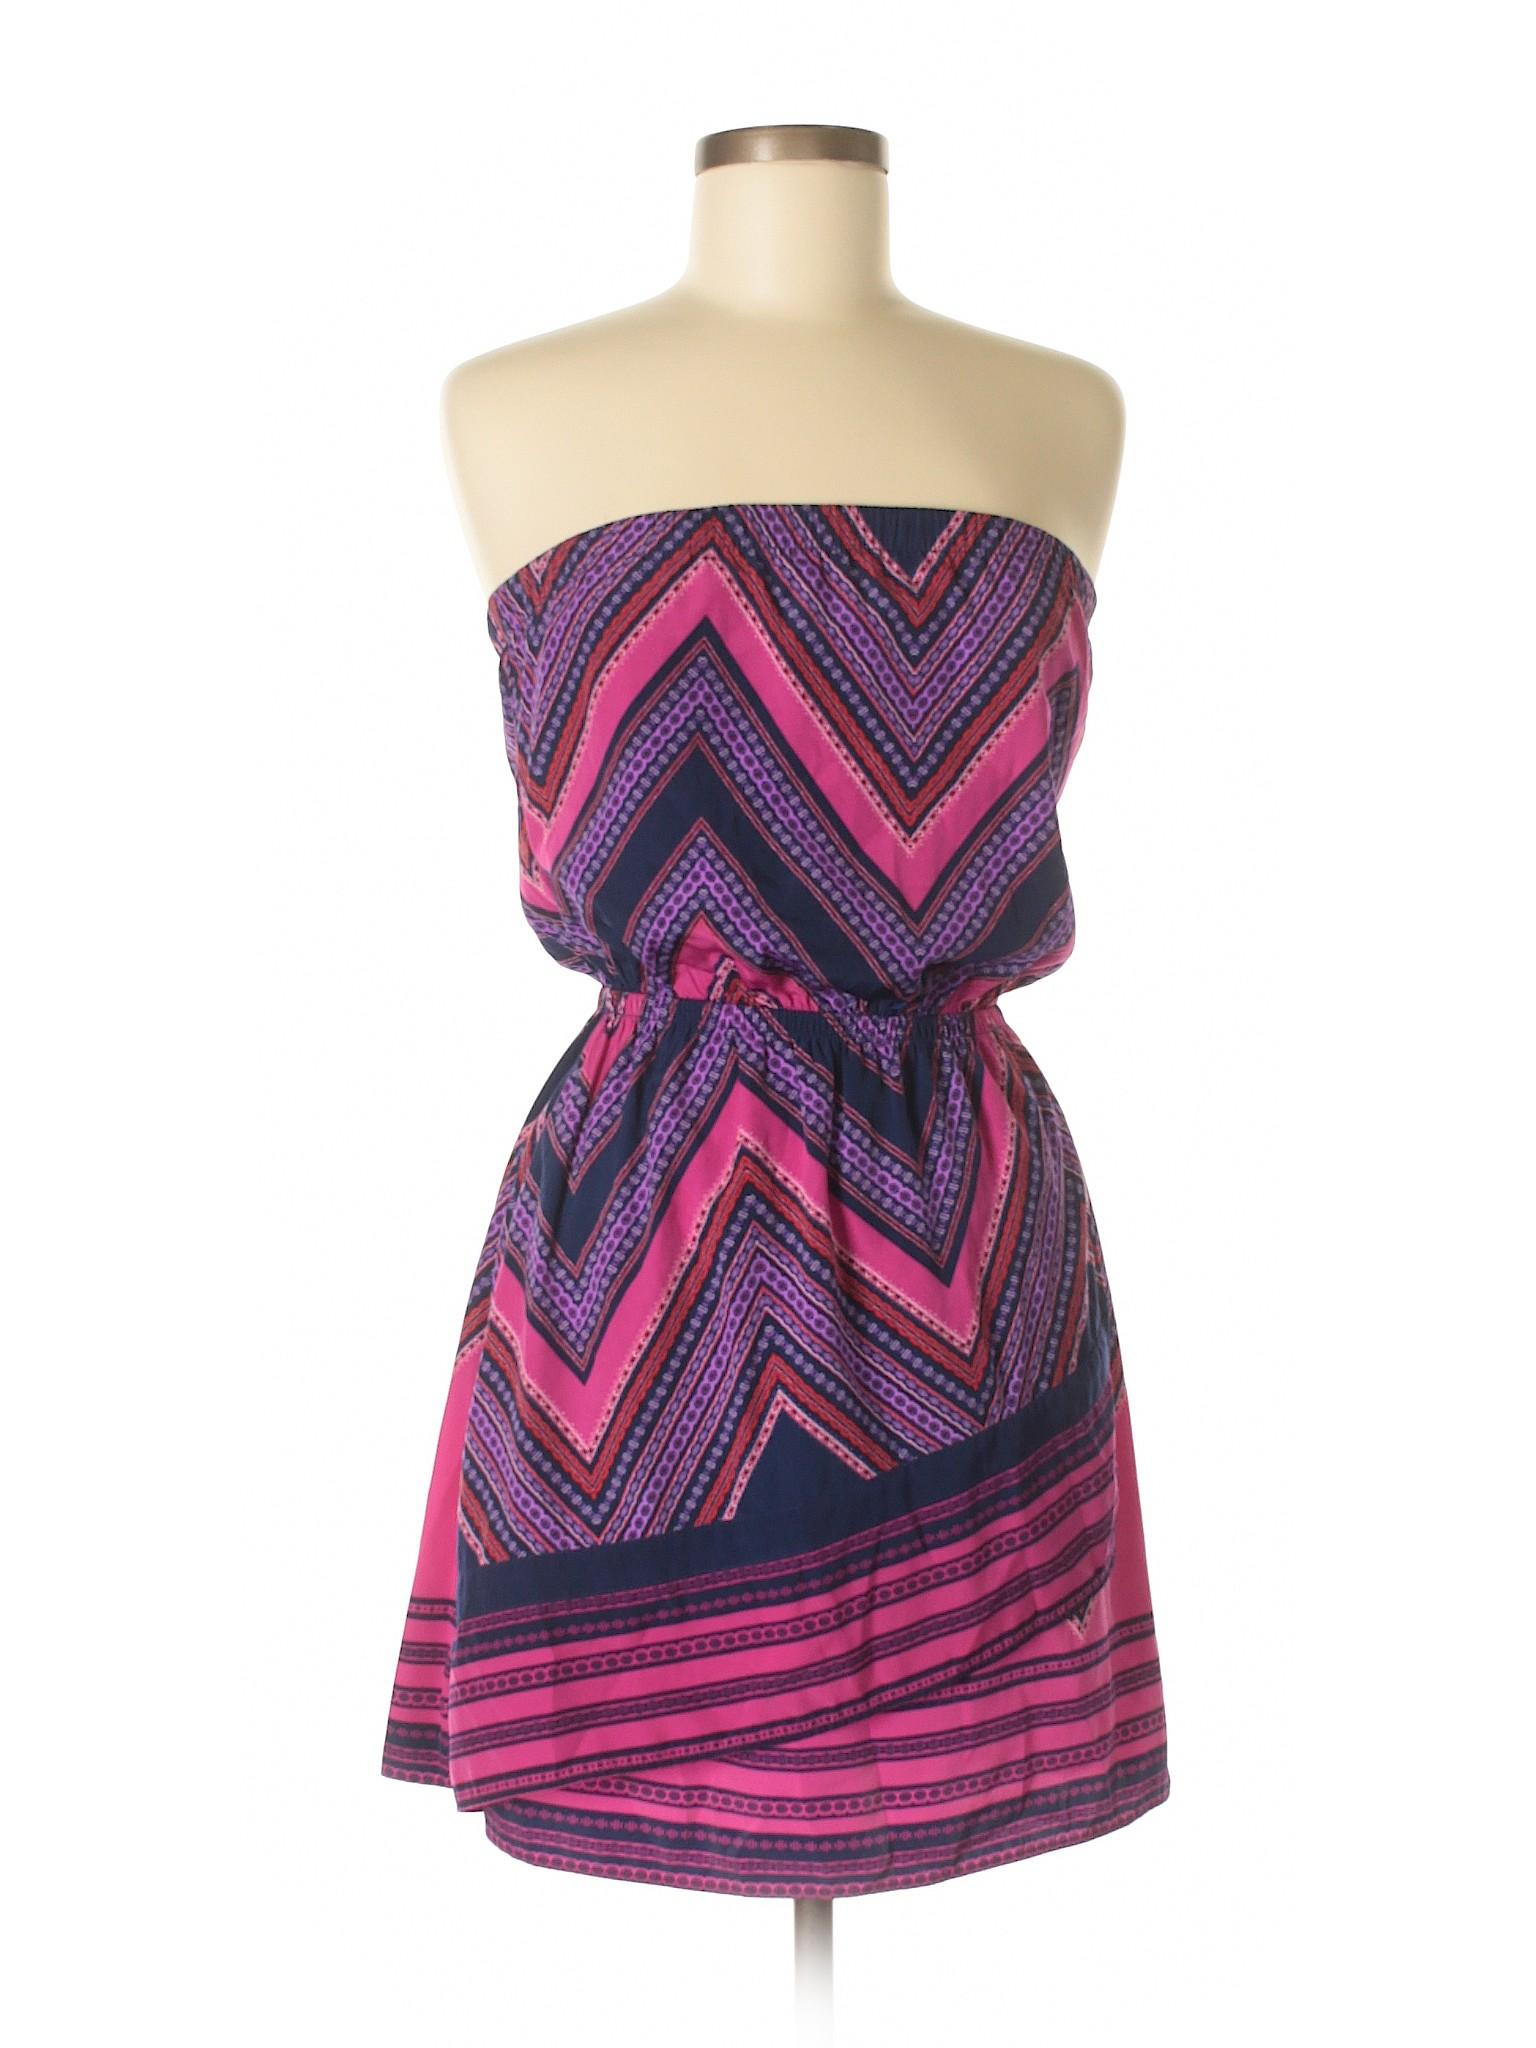 Selling Casual Express Dress Express Dress Selling Selling Casual Selling Casual Dress Casual Selling Dress Express Express Ayqdgf